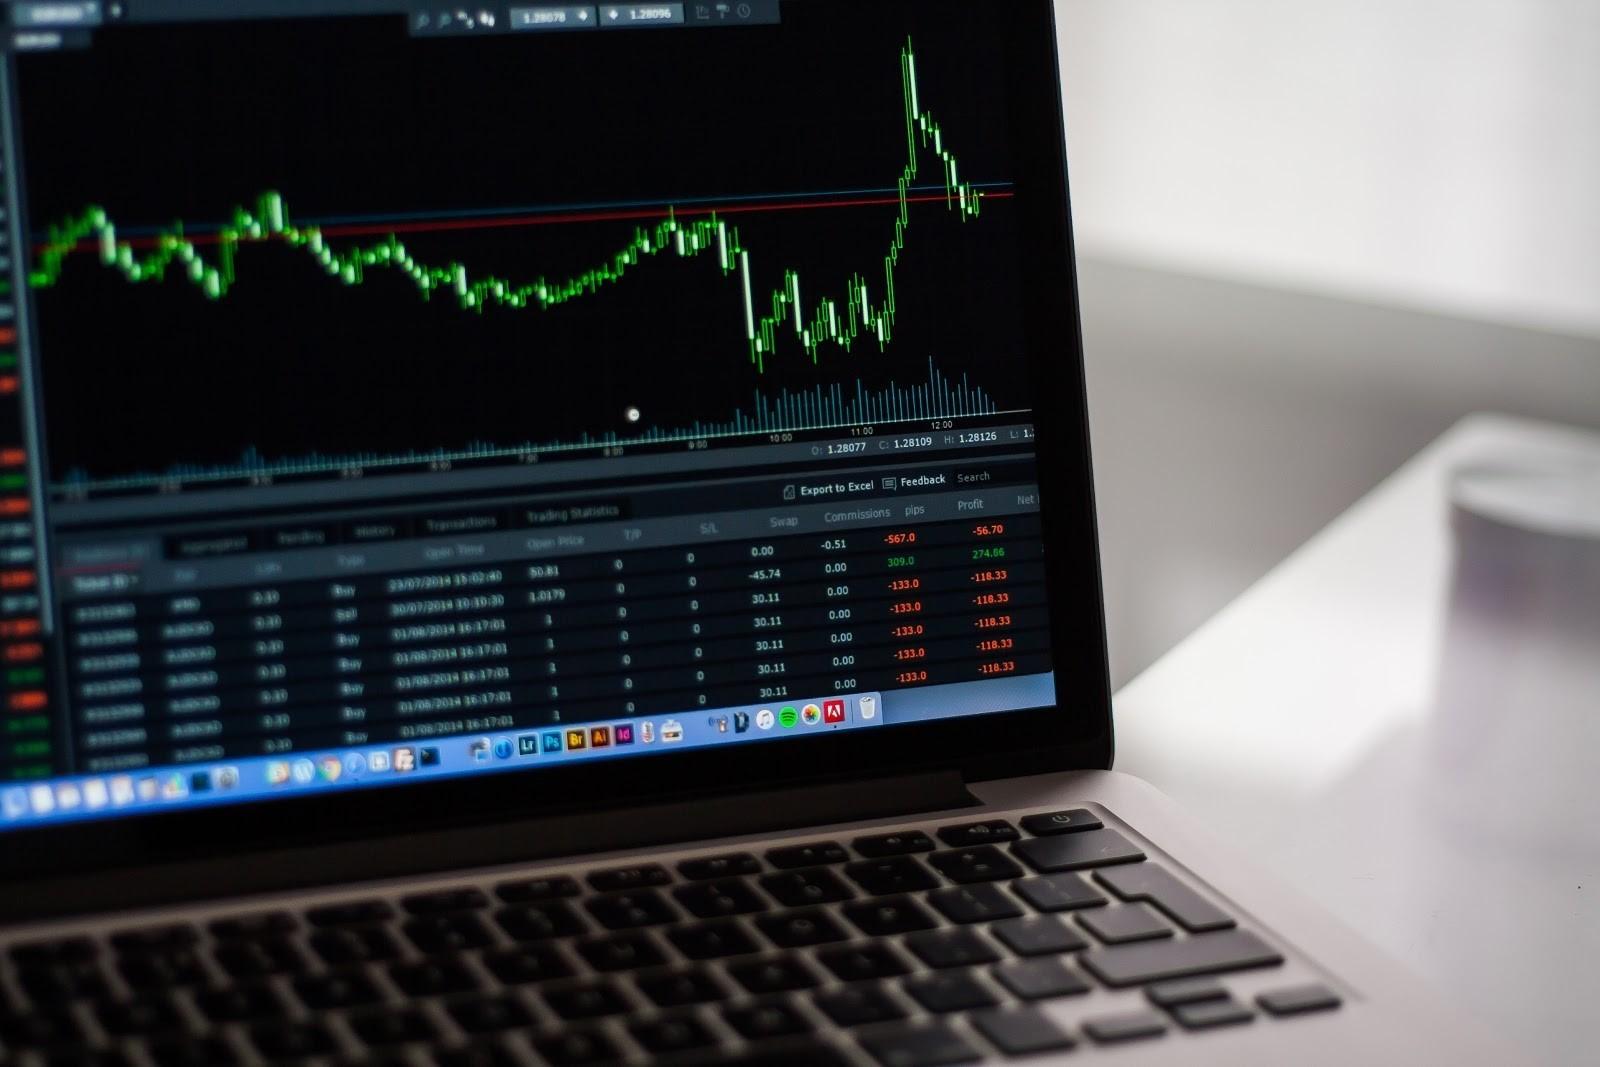 Palantir Technologies Stock Has Potential